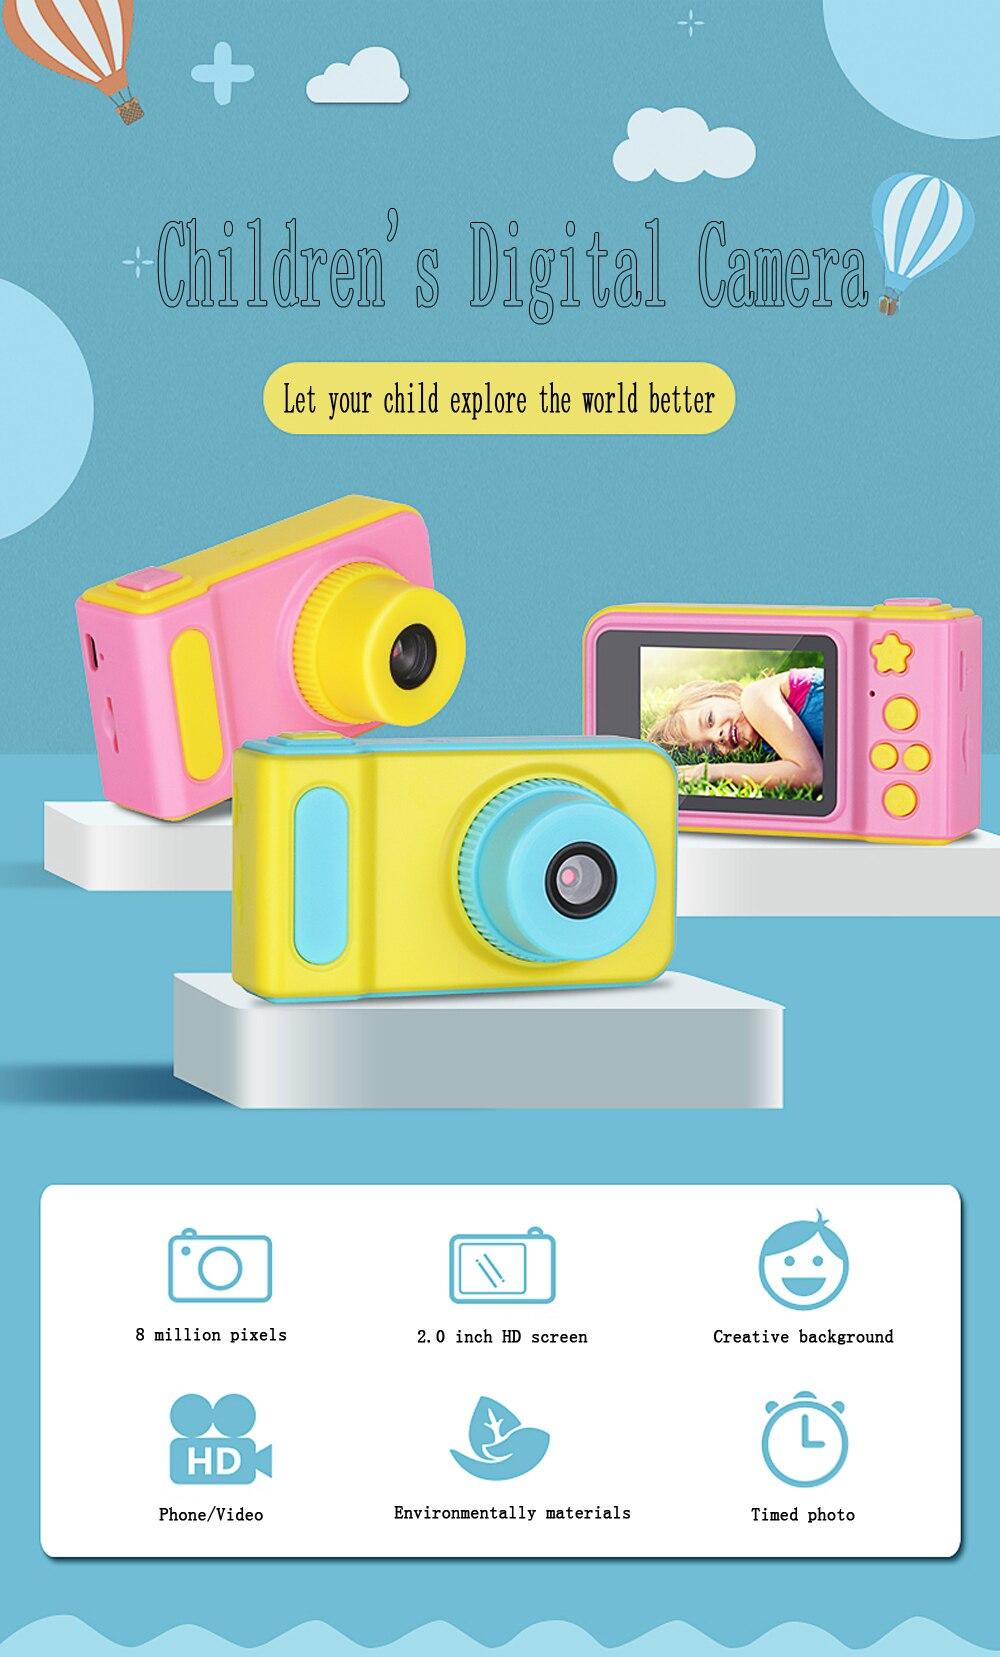 HTB1vlRYXlKw3KVjSZFOq6yrDVXai KOMERY Children's Digital Camera 2 Inch Screen Display Cartoon Cute Camera Birthday Gift 1080P Toddler Toys Video Camera For Ki